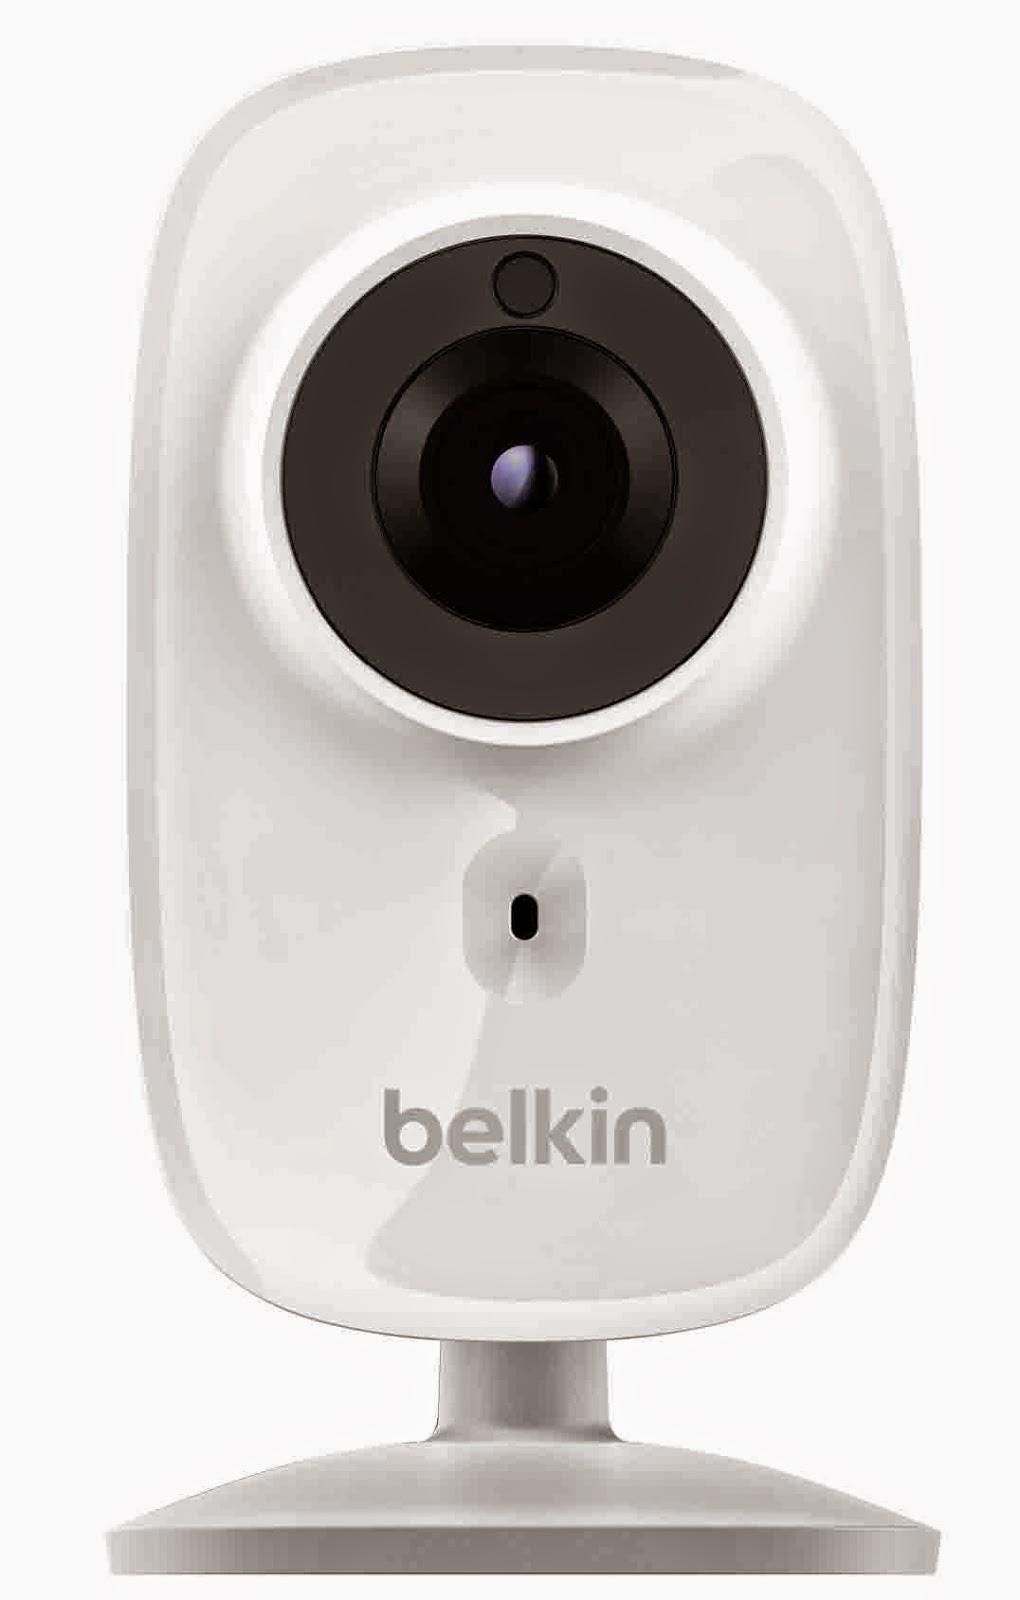 Viaja-tranquilo-relajado-Belkin